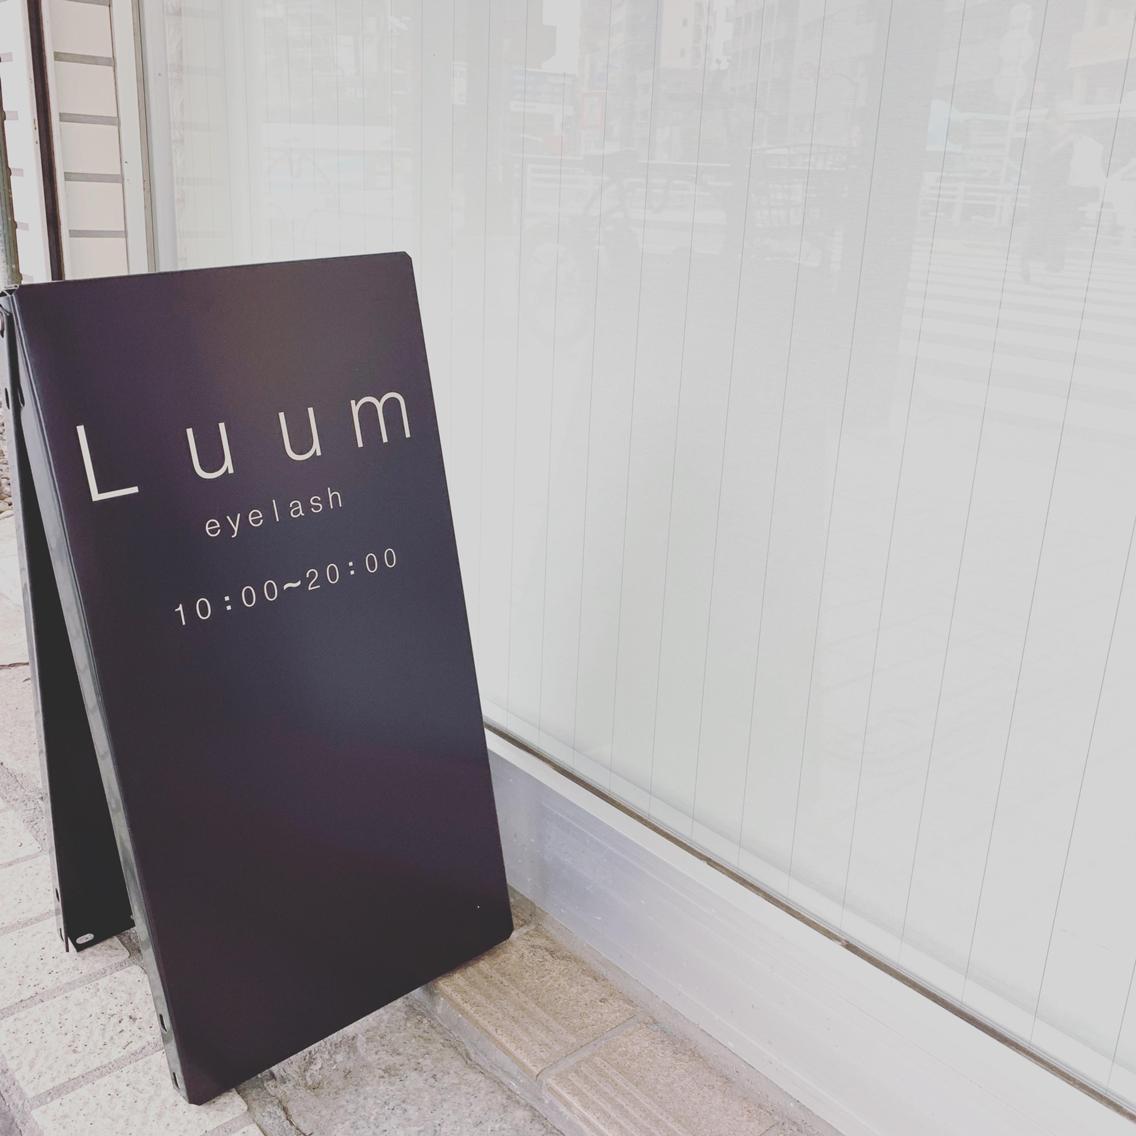 Luum eyelash所属・Luumeyelashの掲載